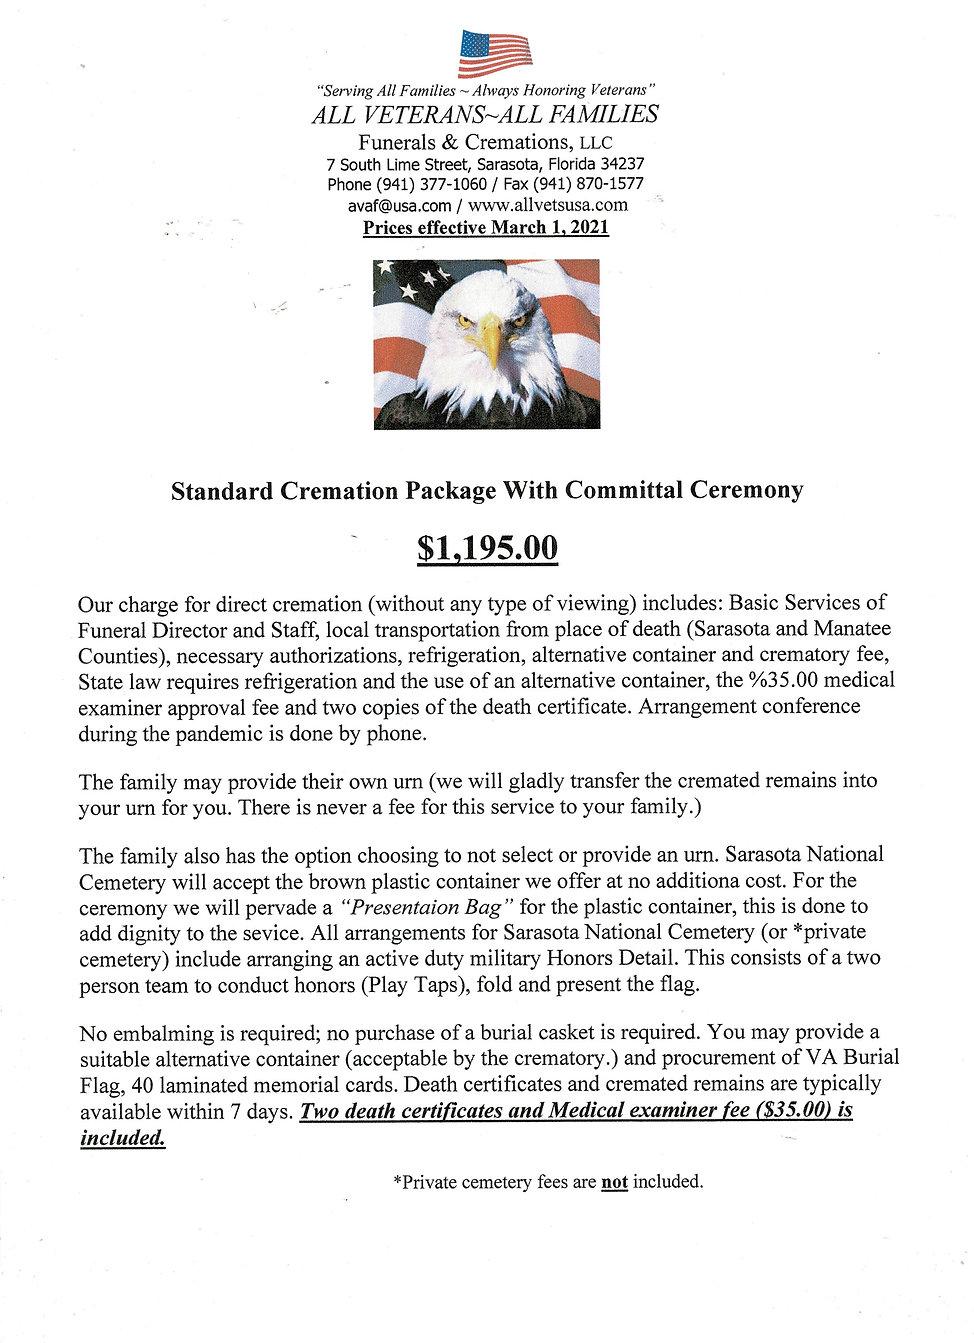 1C - Crem Ceremony - No Urn  3-20-21.jpg